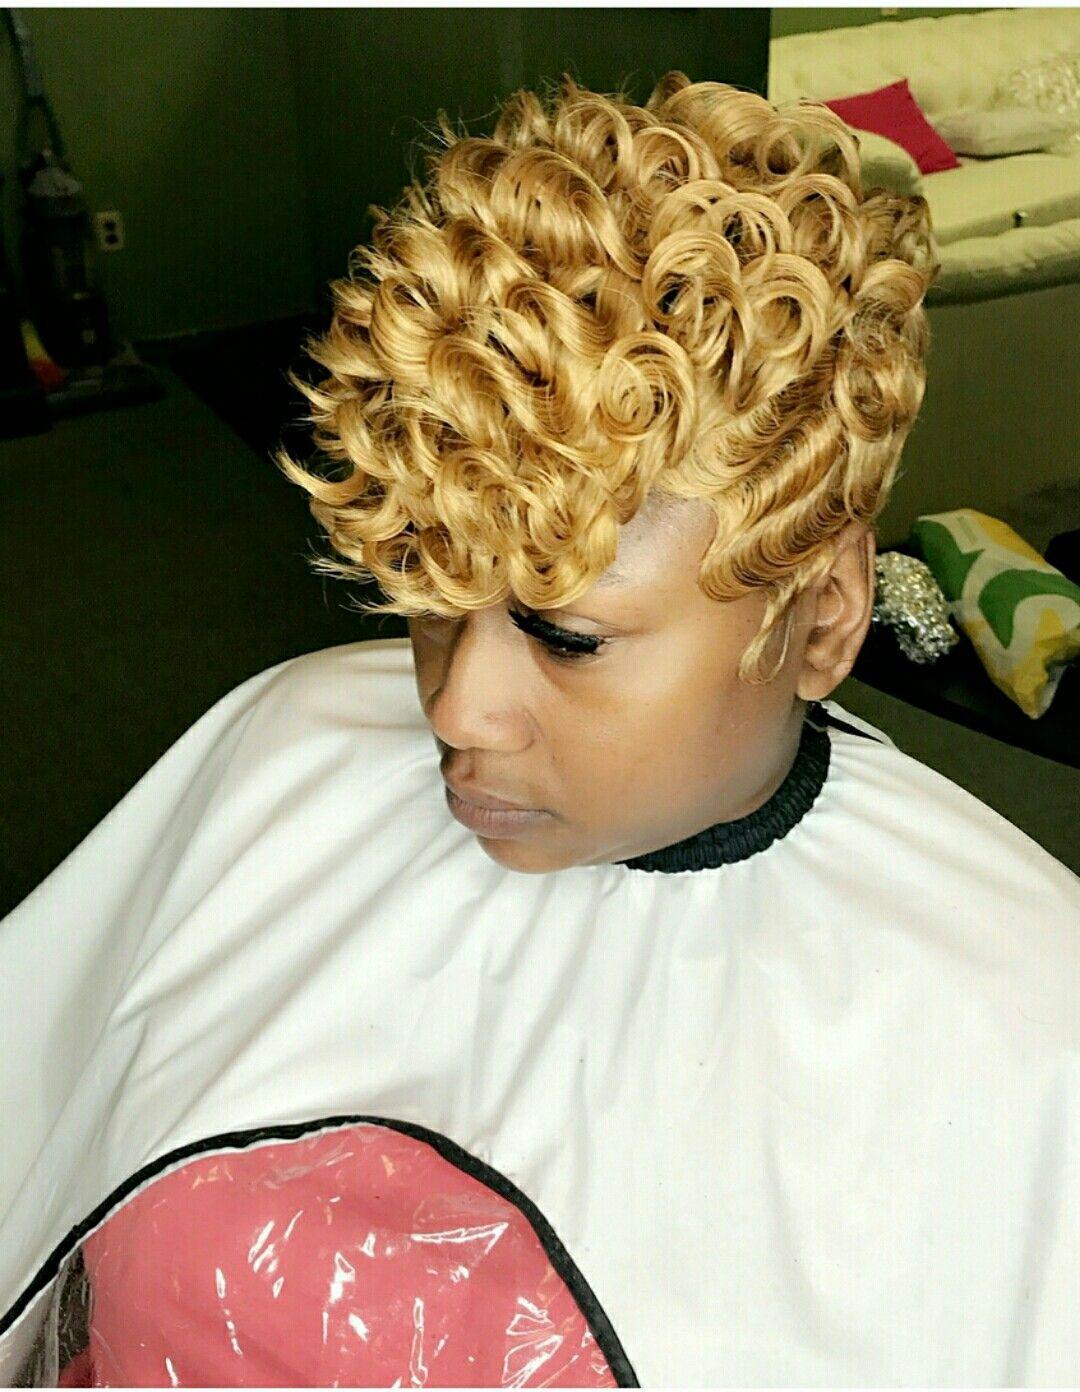 Pin by montoya ruiz on coiffures pinterest short hair shorts